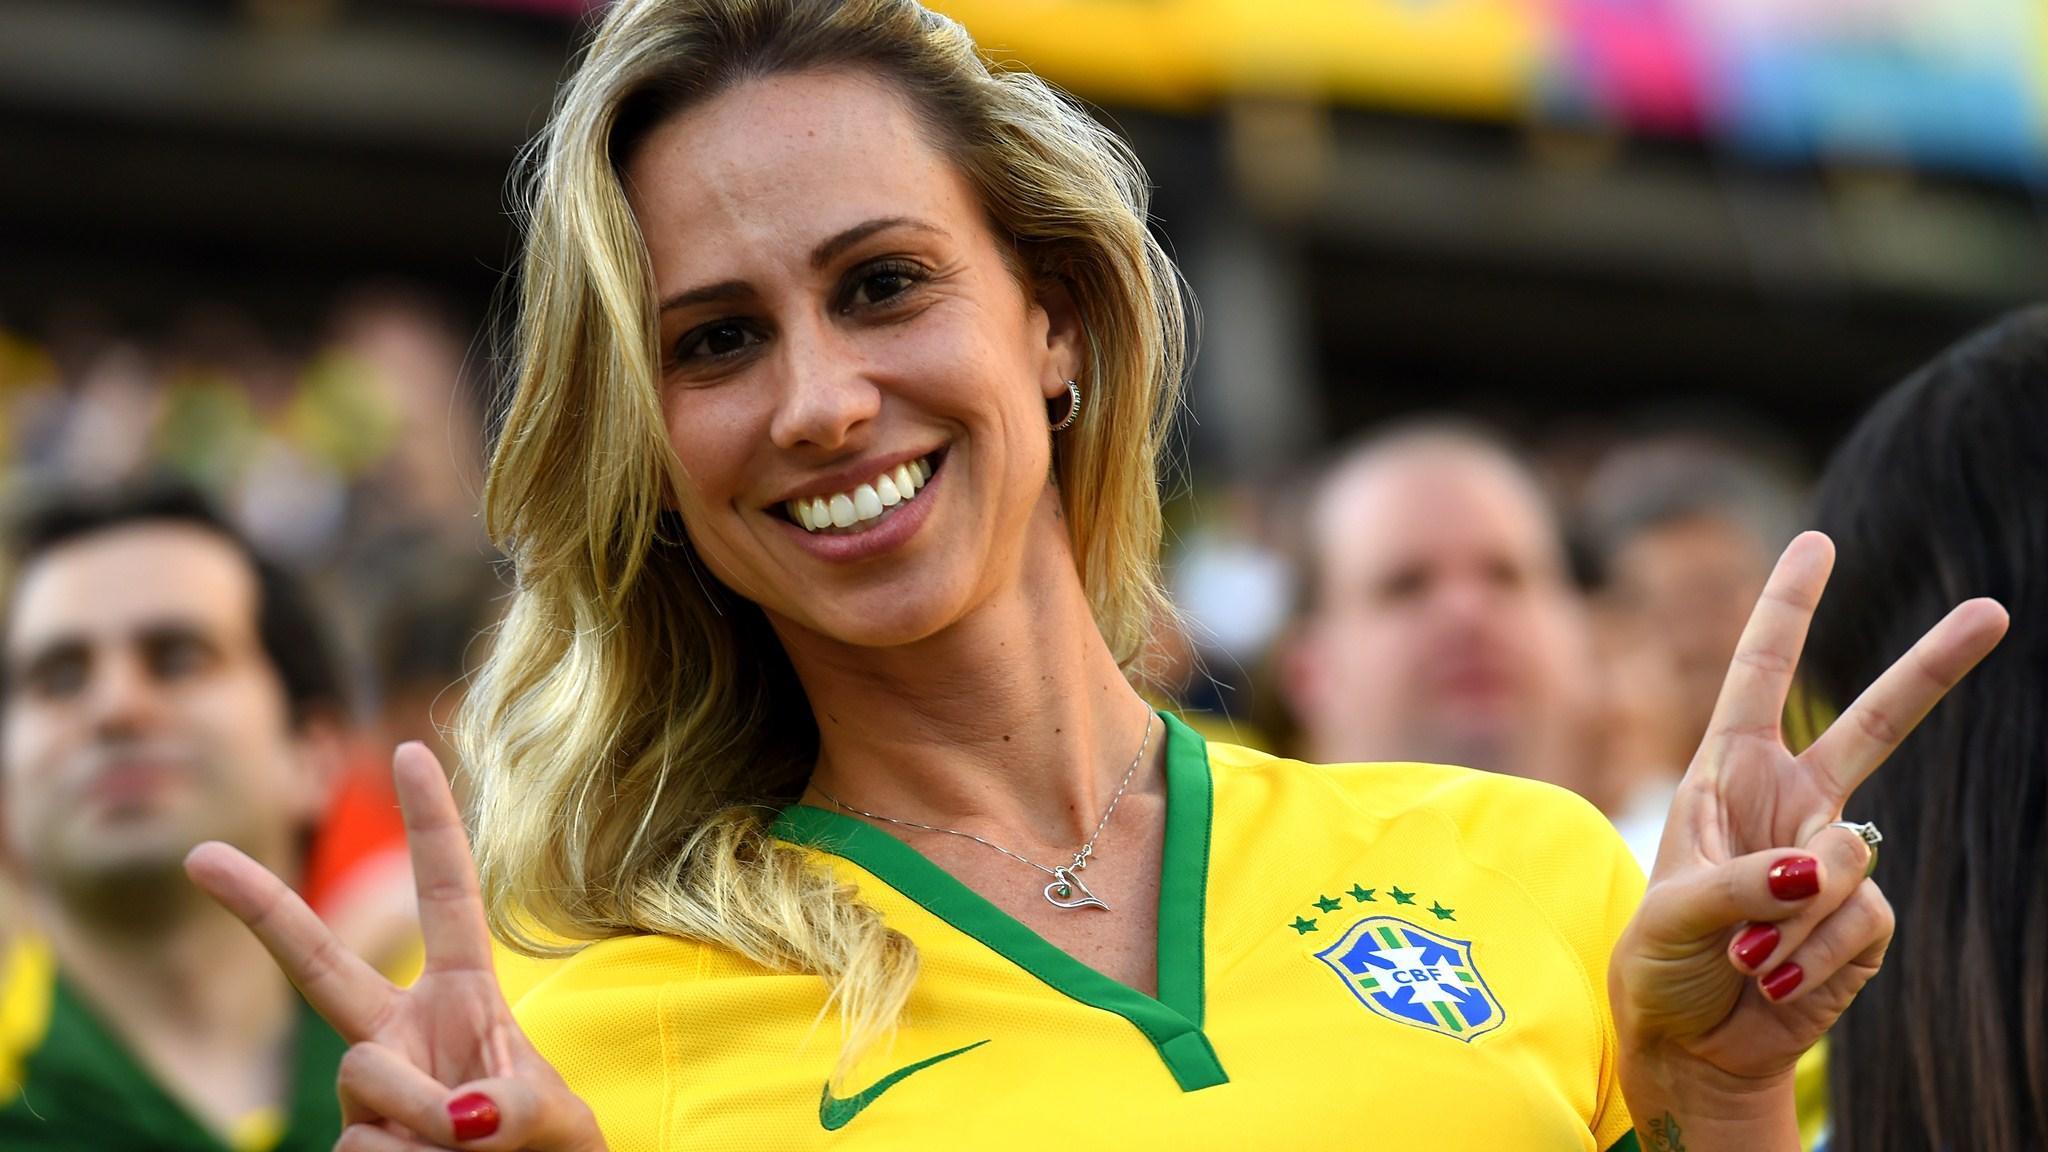 190 - Brazil-Croatia [3-1] -- 12 Jun 2014 - 17-00 -- Sao Paulo - Arena Corinthians